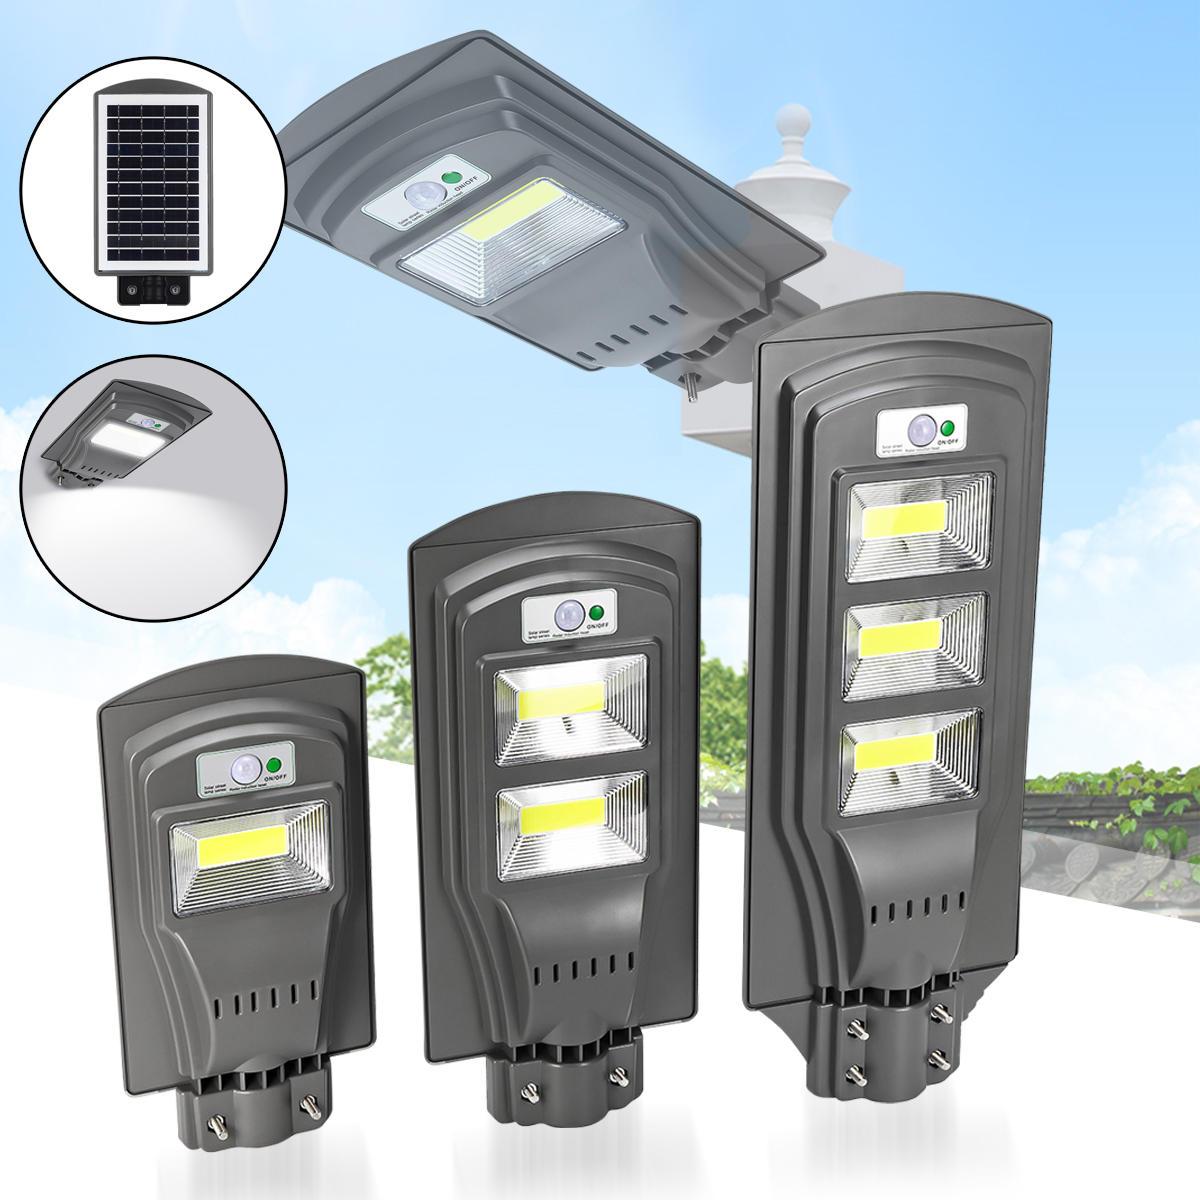 20W 40W 60W Movido a energia solar PIR Movimento Sensor Street Lamp Outdoor Garden Yard Light